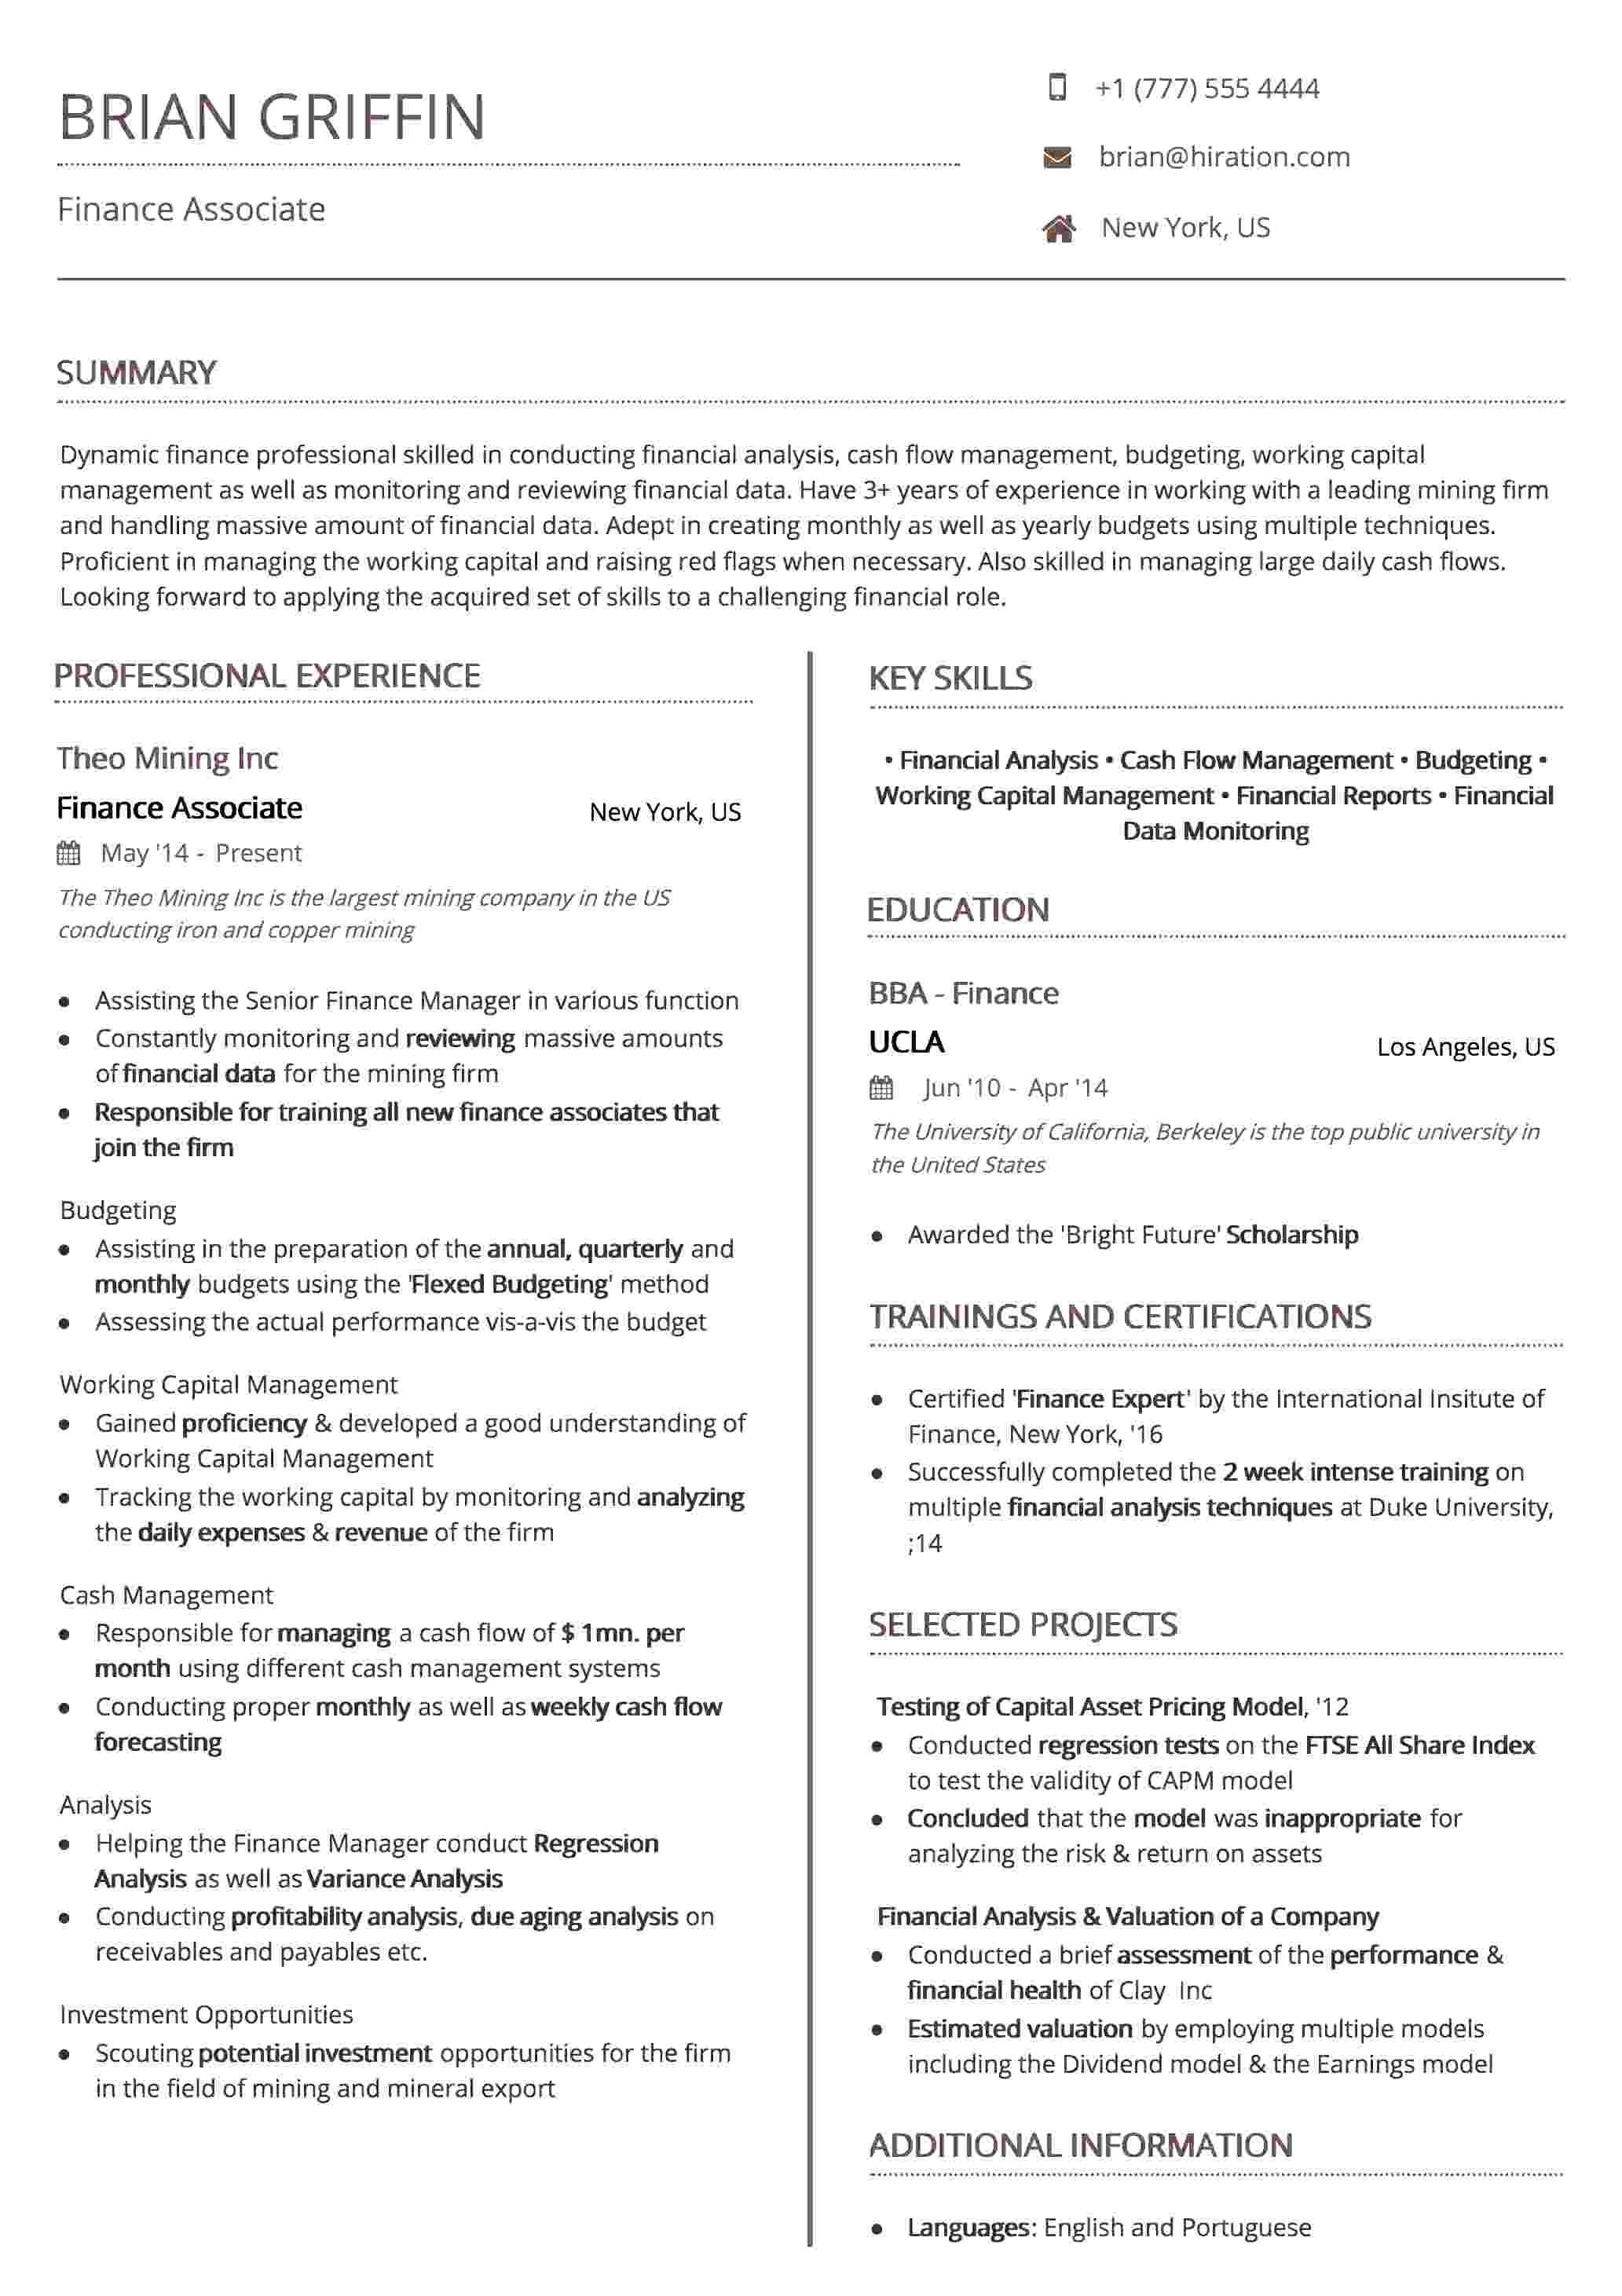 Resume Template: Uniform Brown